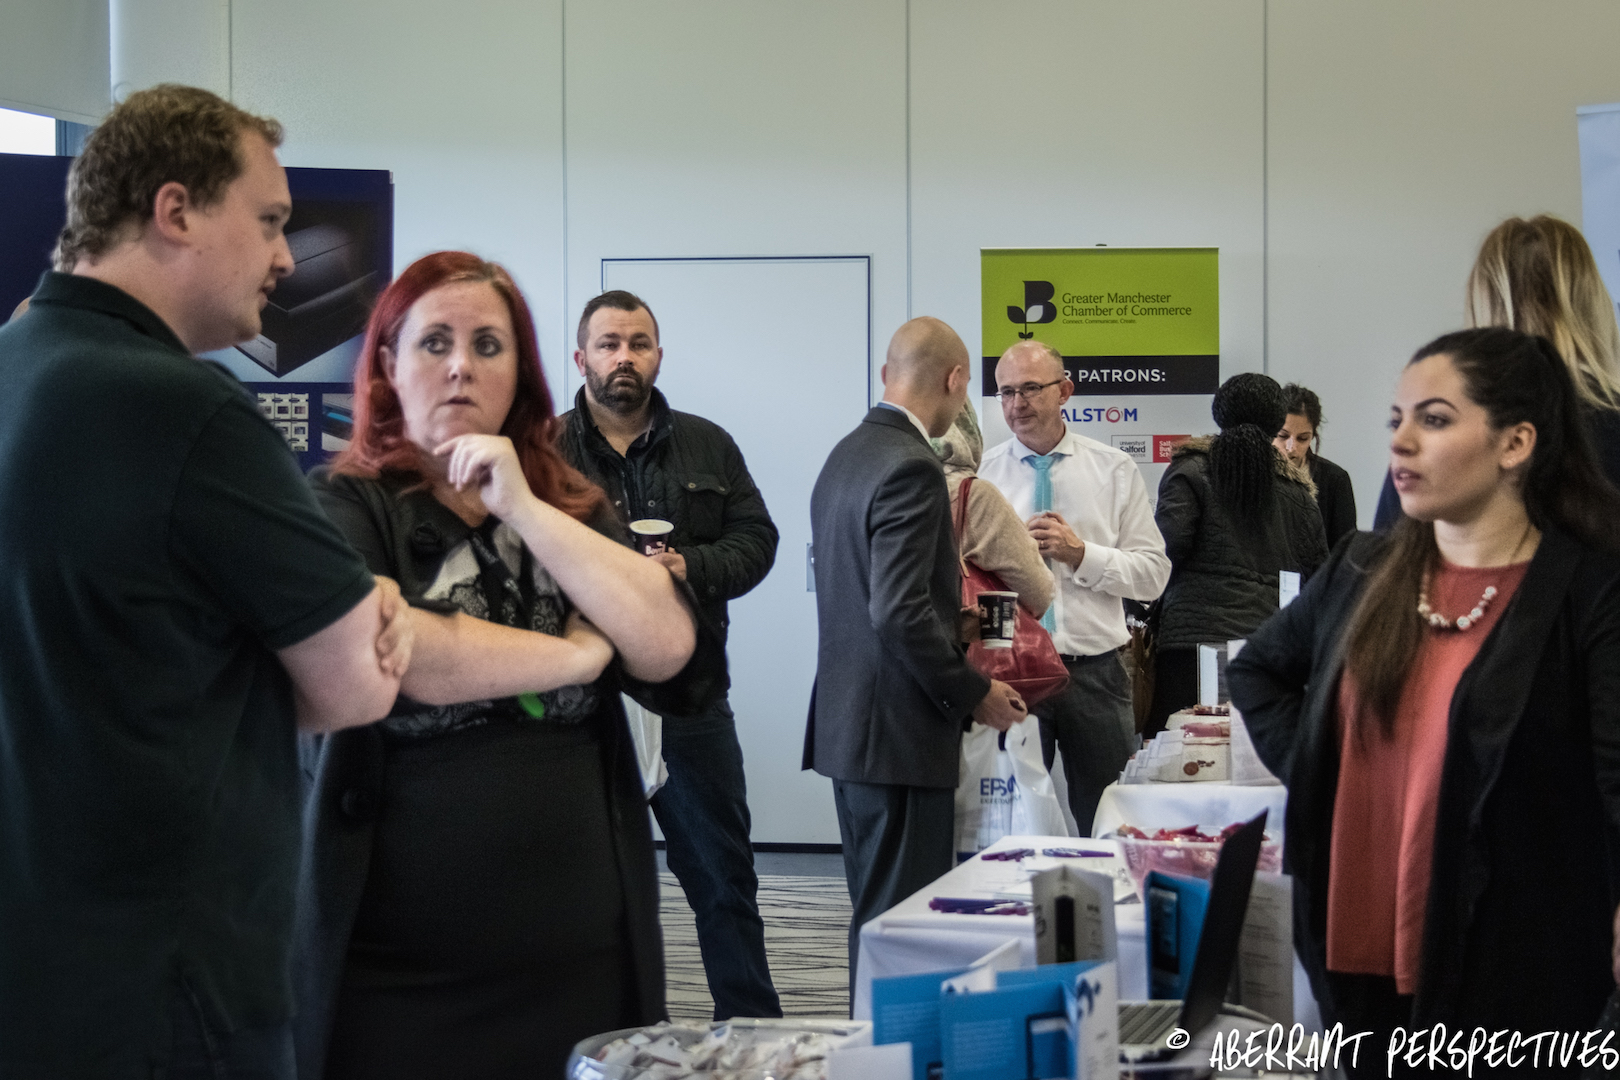 Manchester-Biz-Fair=Gallery-Image-4